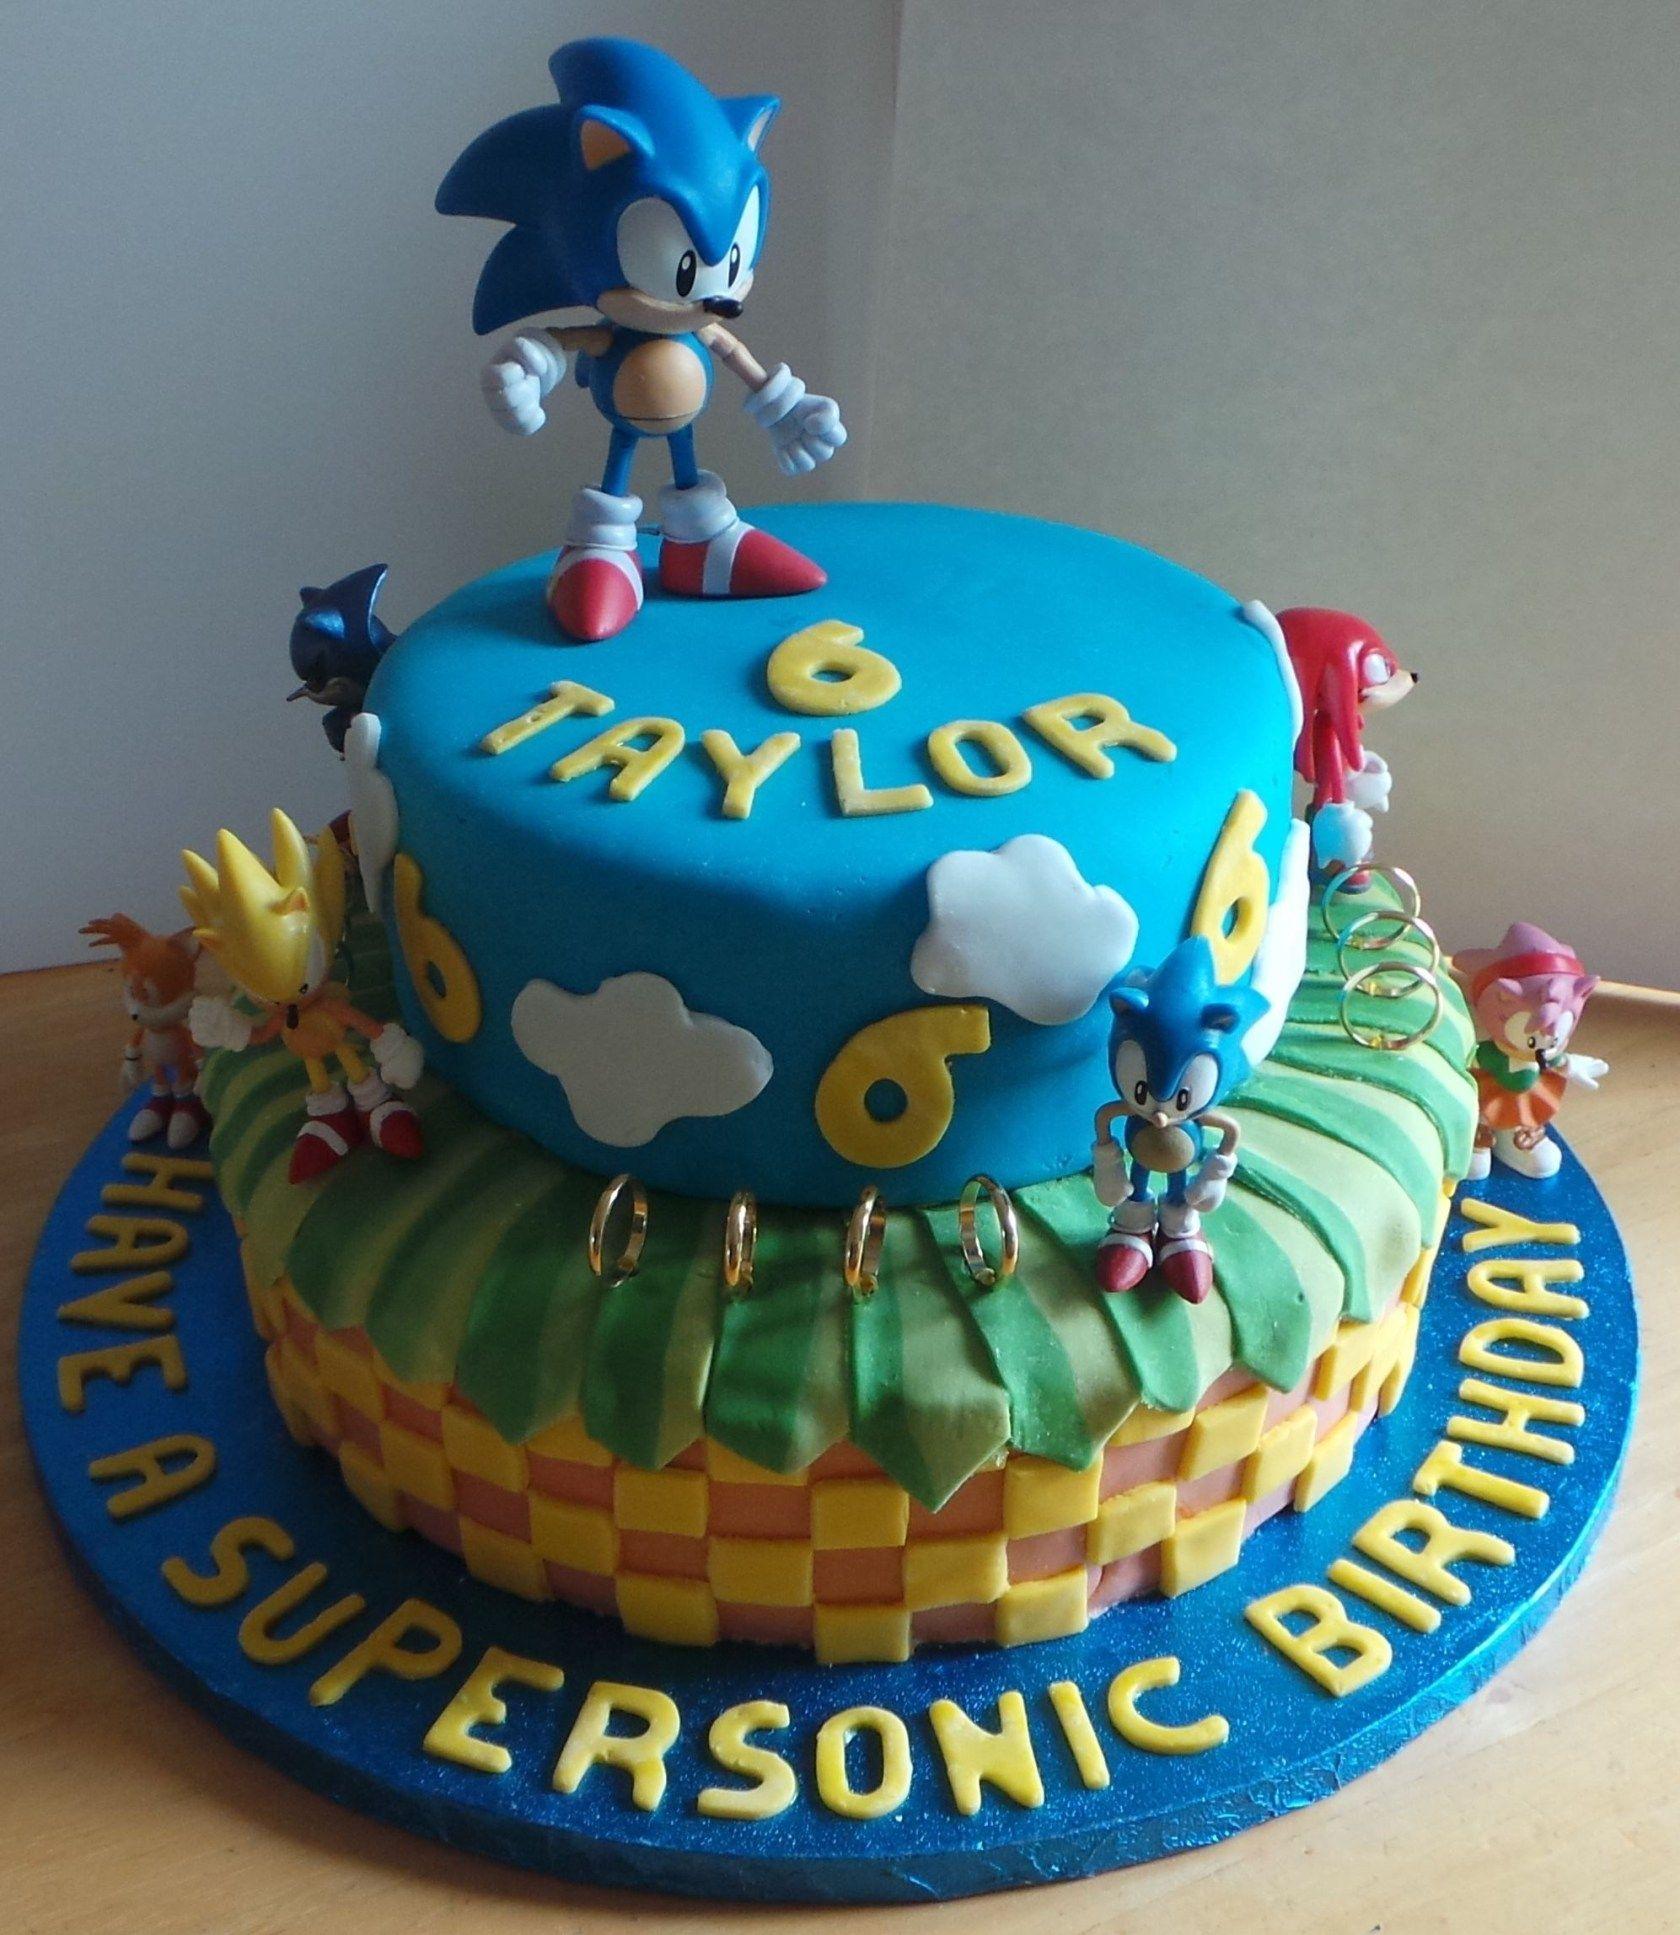 Sonic Birthday Cake Sonic The Hedgehog Cake Recipes To Cook Pinterest Sonic Sonic Cake Sonic Birthday Cake Sonic The Hedgehog Cake